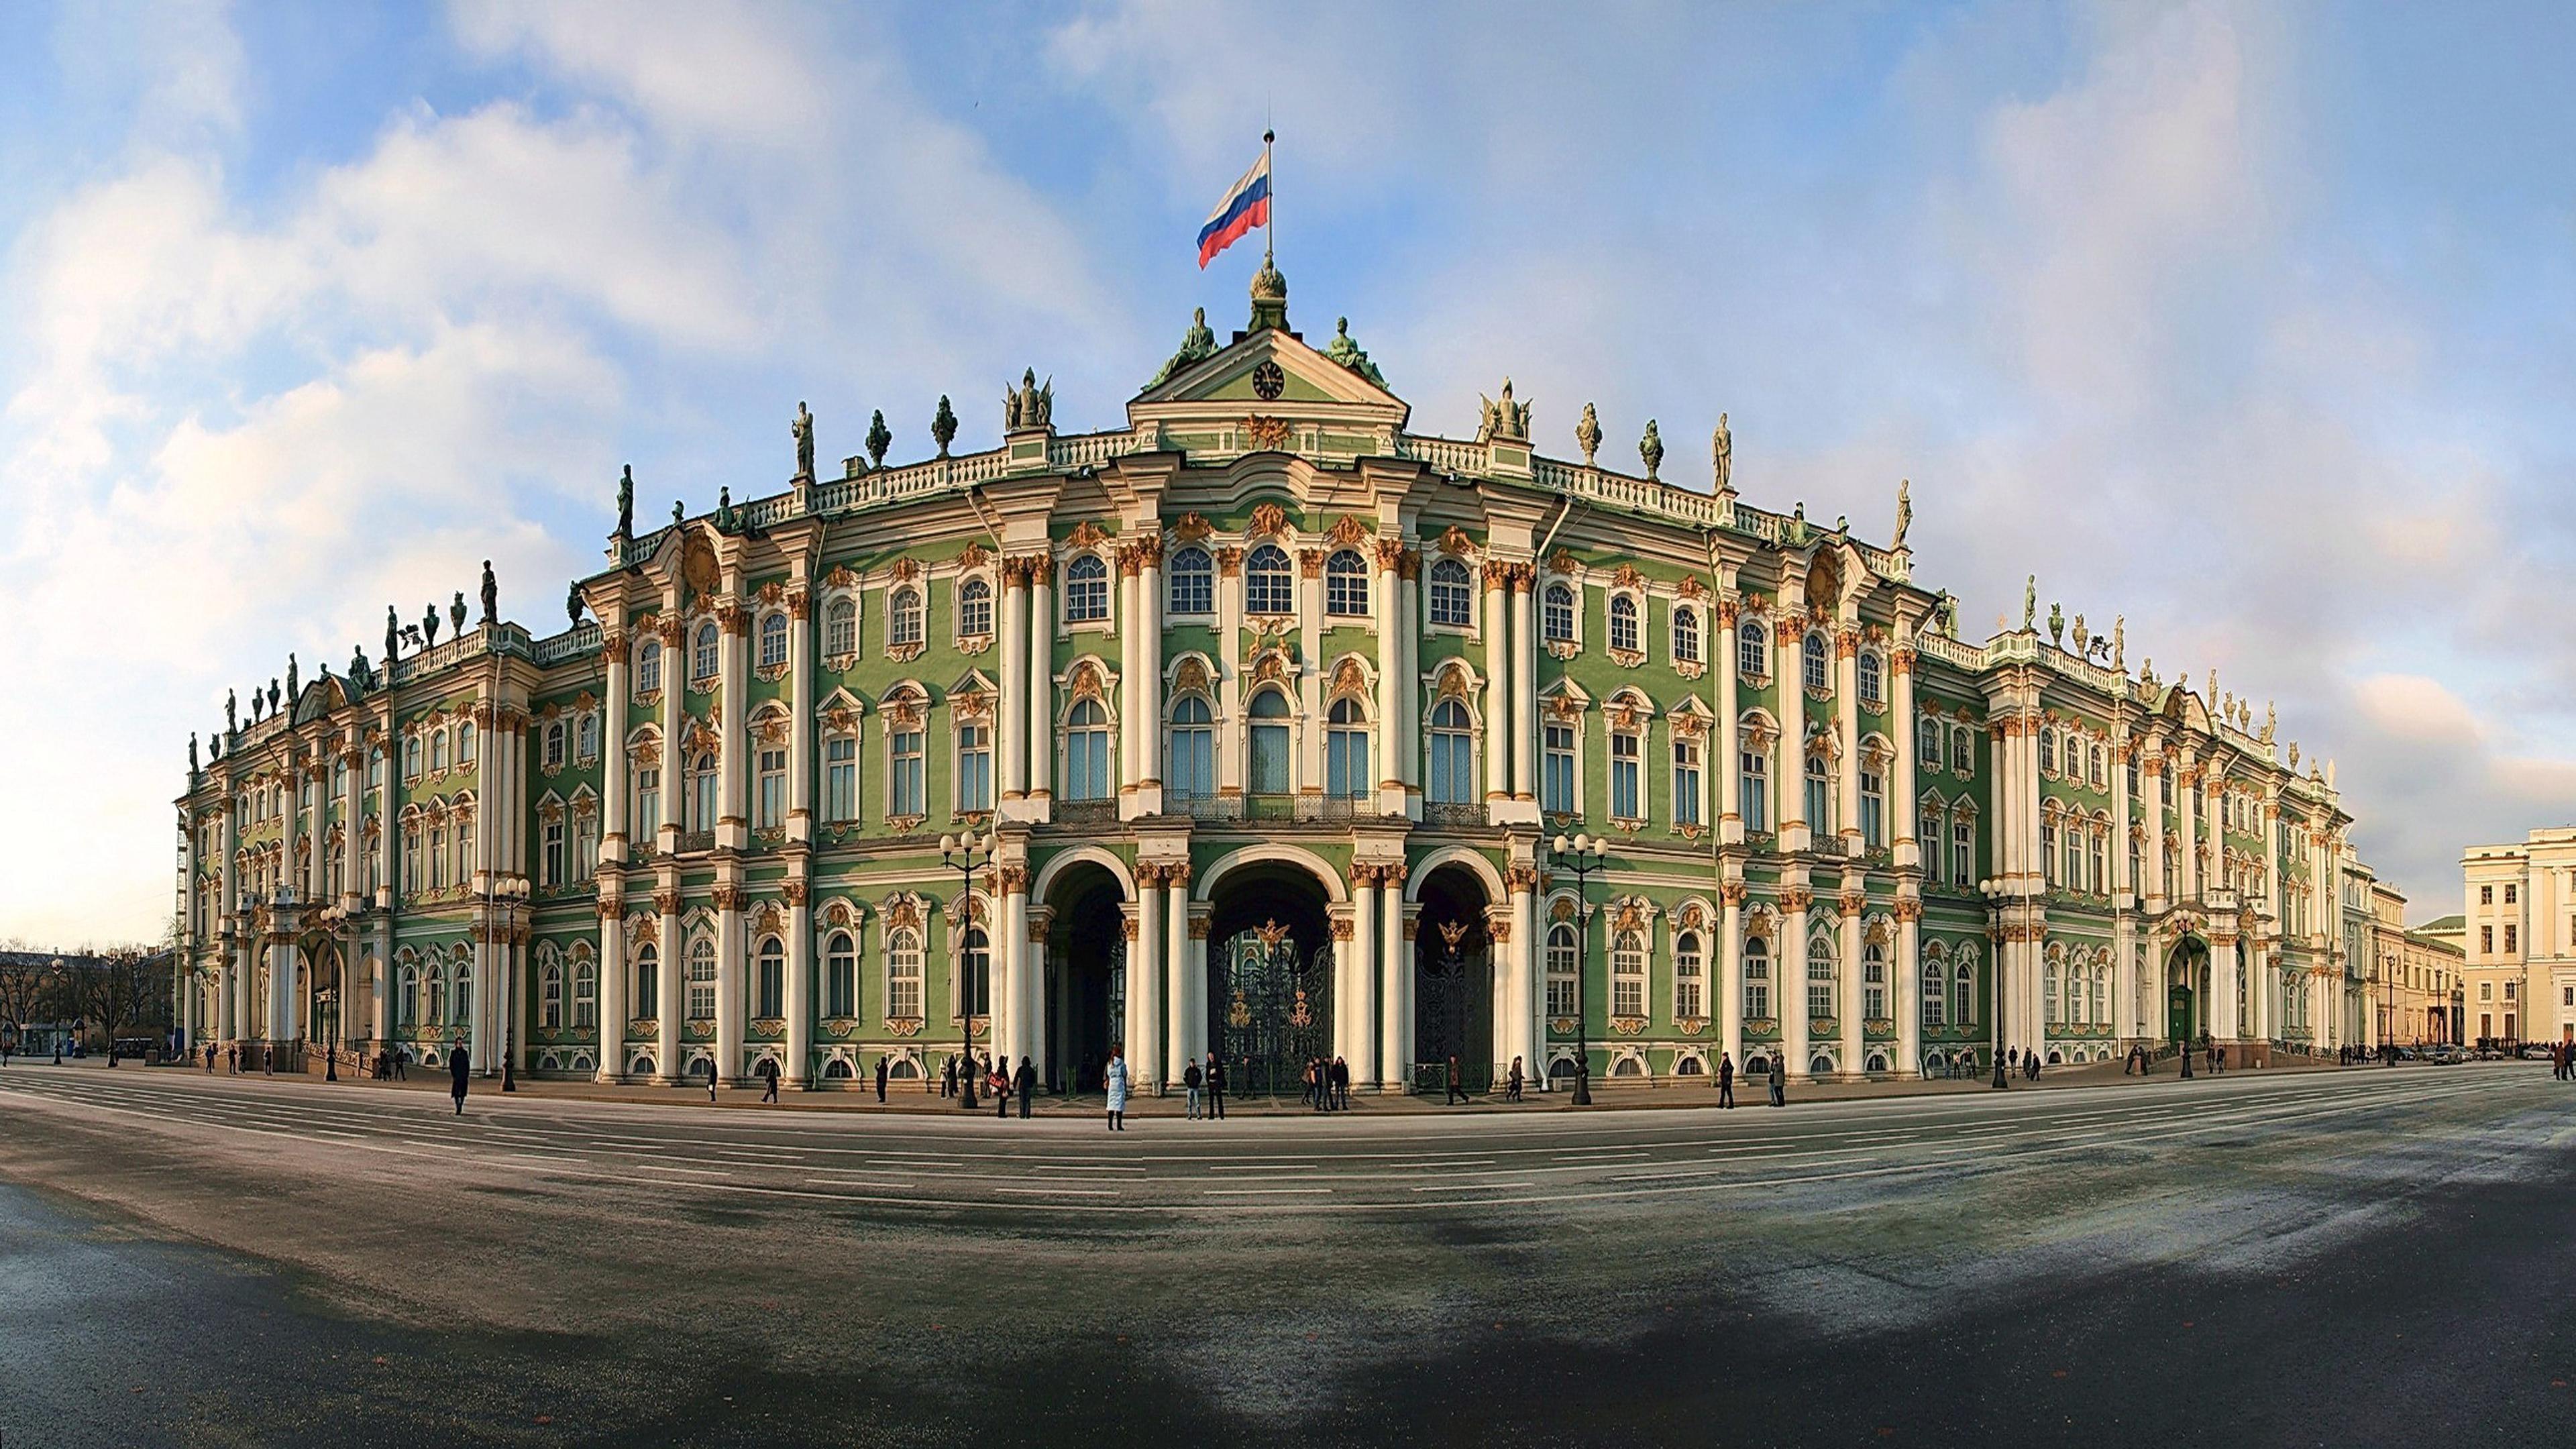 High Resolution Desktop Wallpapers Cars Russia St Petersburg Winter Palace 0795 Wallpapers13 Com